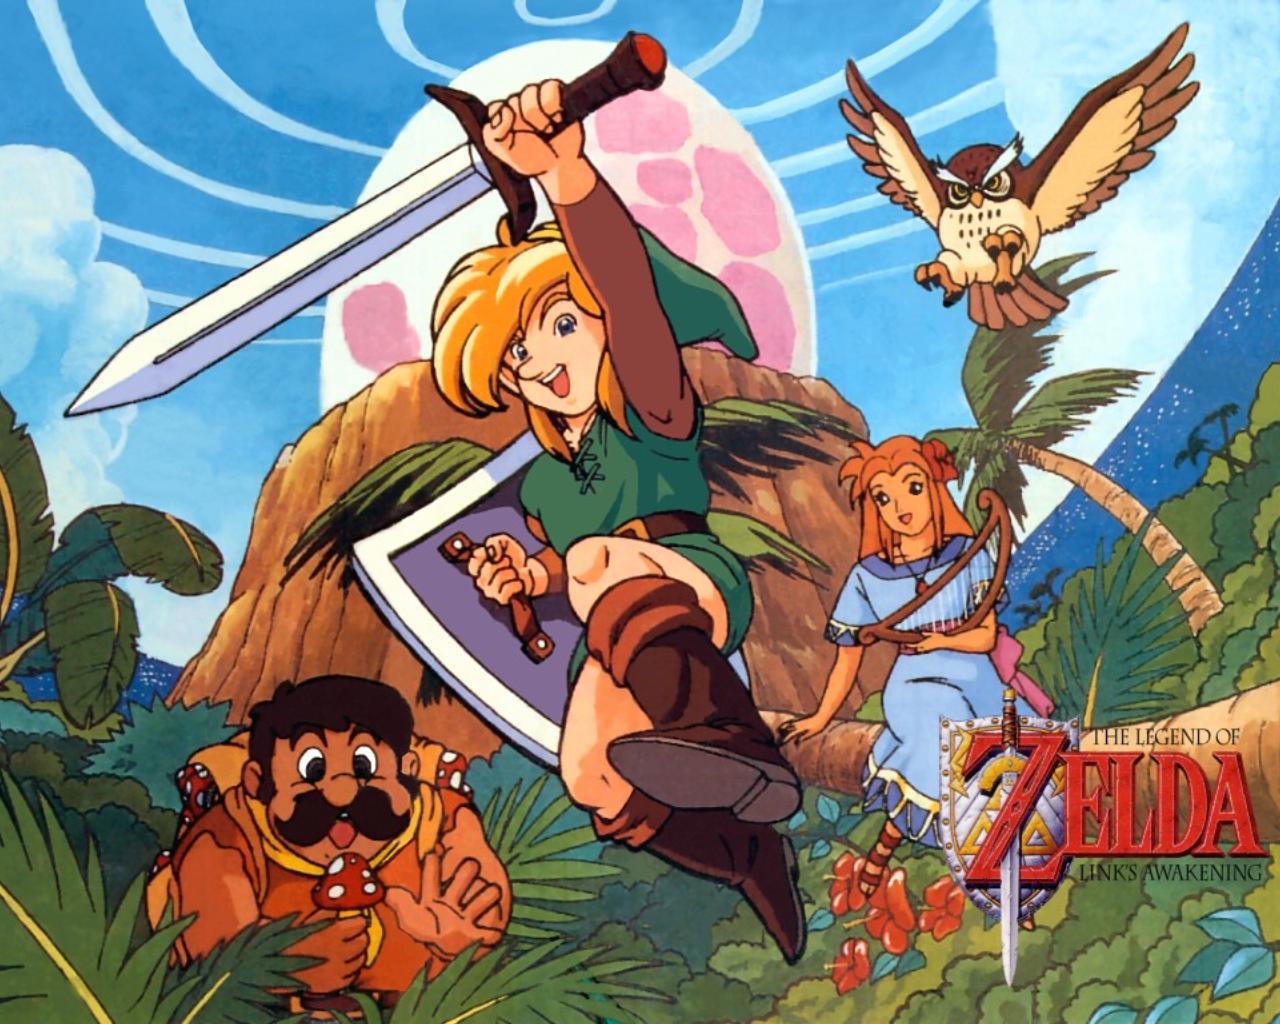 The Legend of Zelda: Link's Awakening is a game everybody